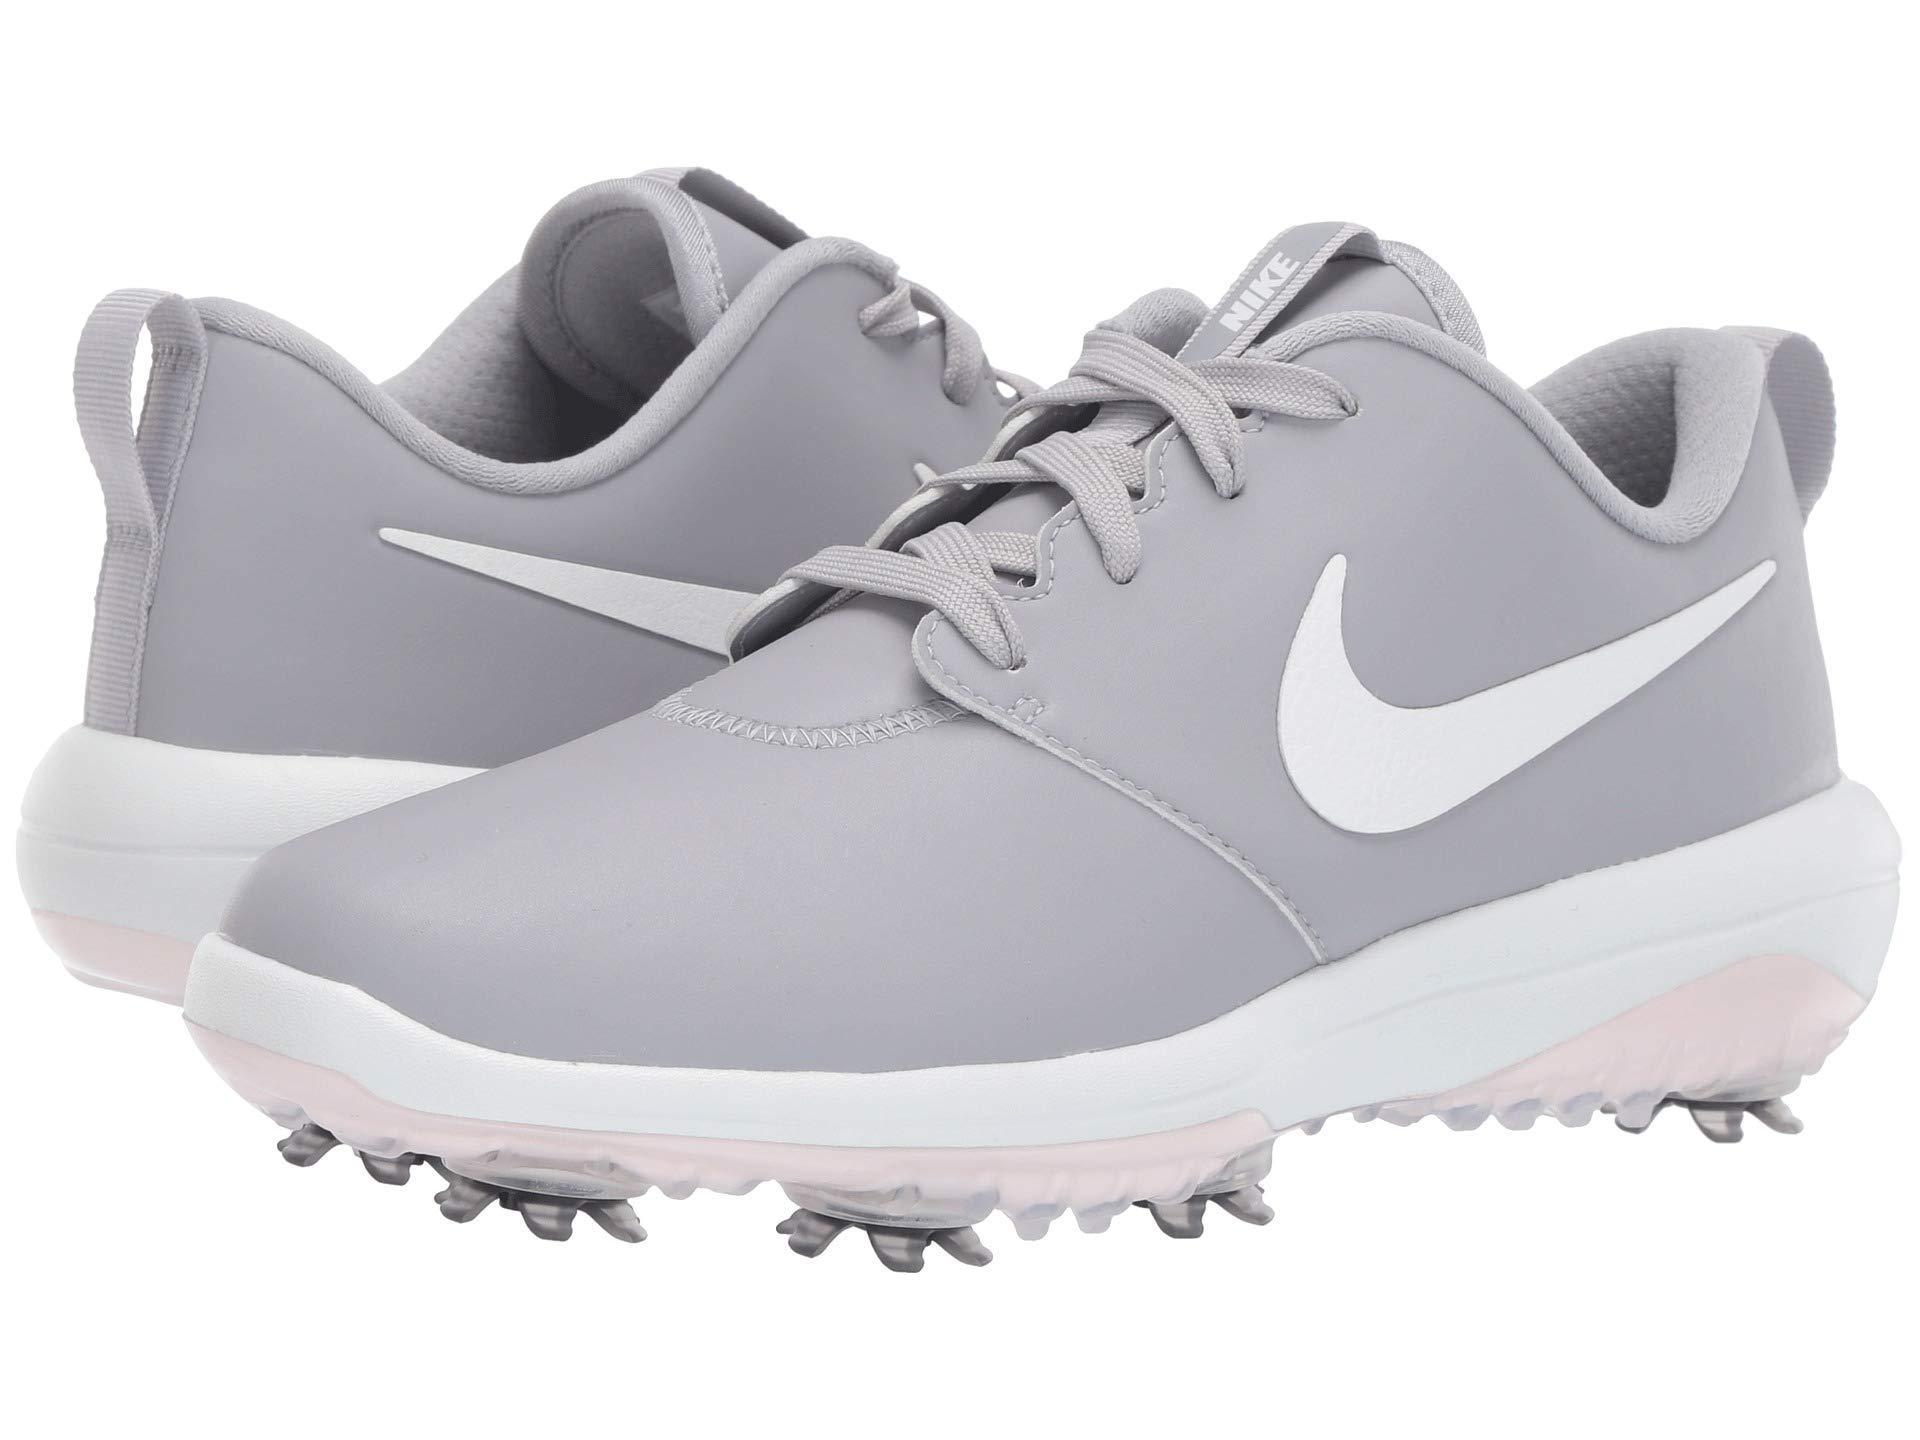 eb8253cceb37 Nike - Gray Roshe G Tour Waterproof Golf Shoe - Lyst. View fullscreen